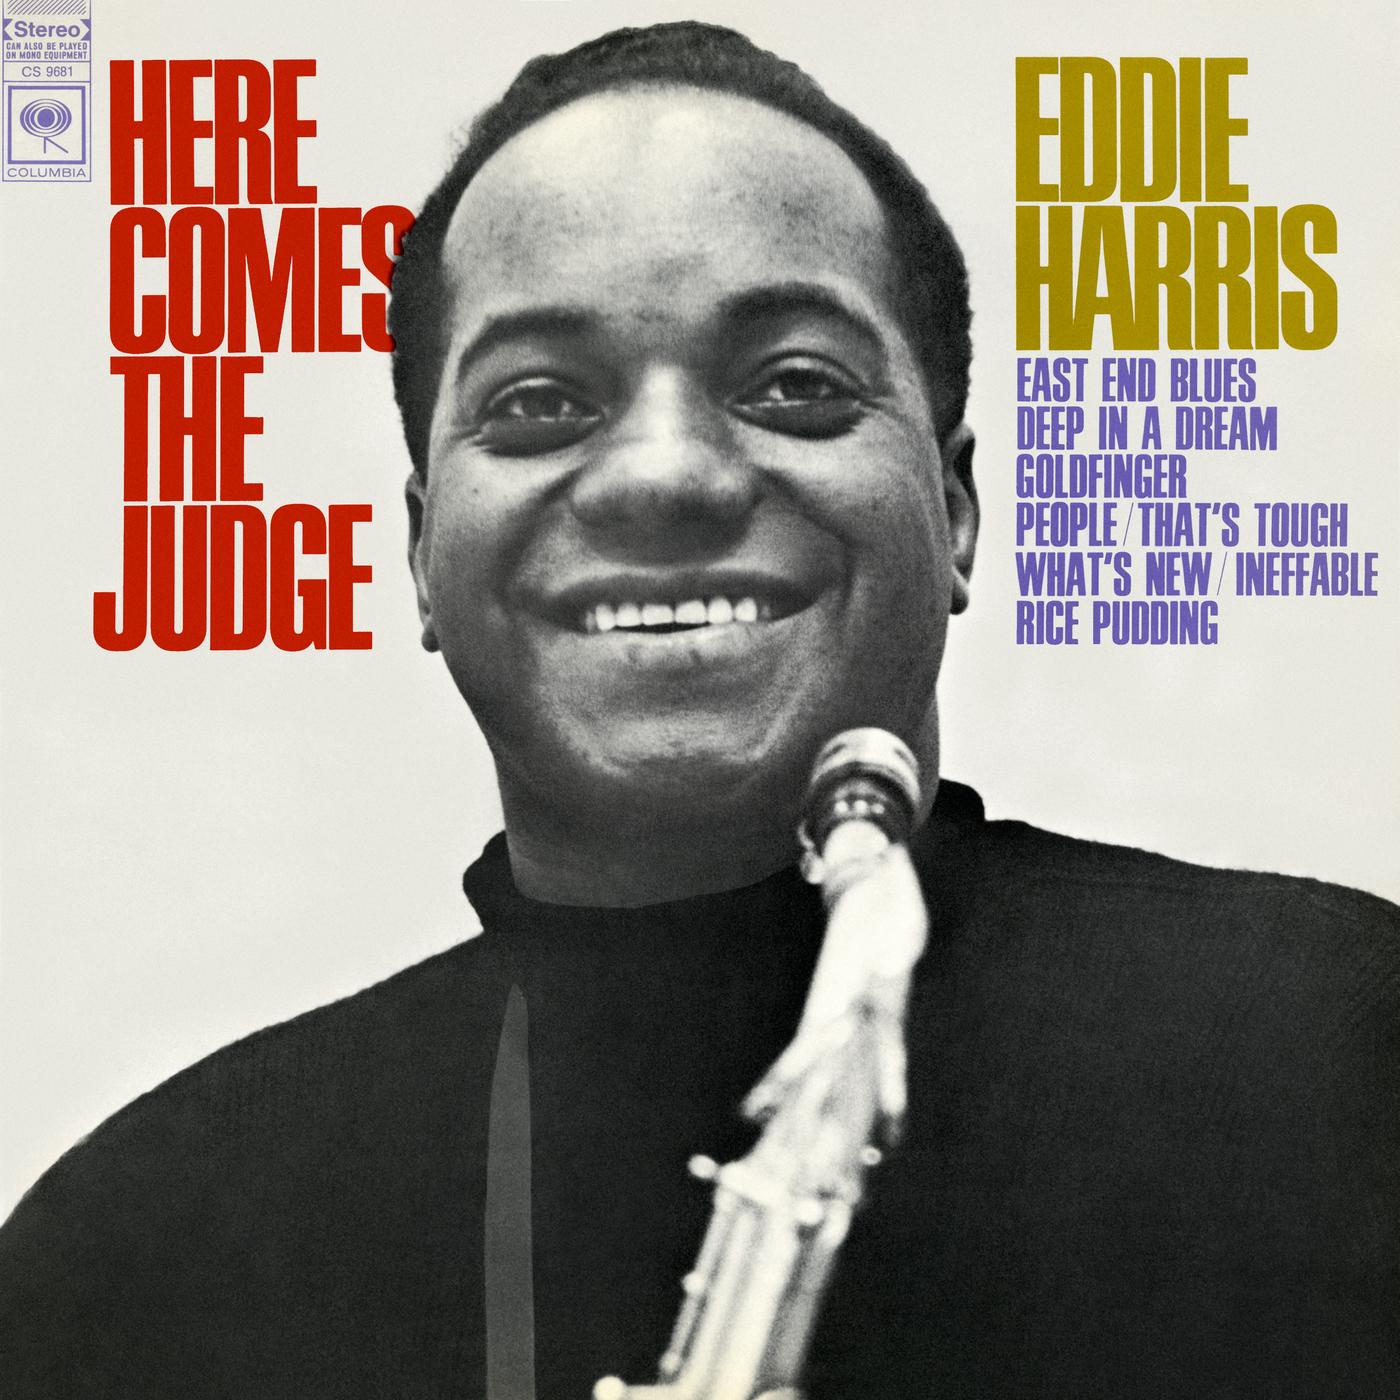 Here Comes the Judge - Eddie Harris